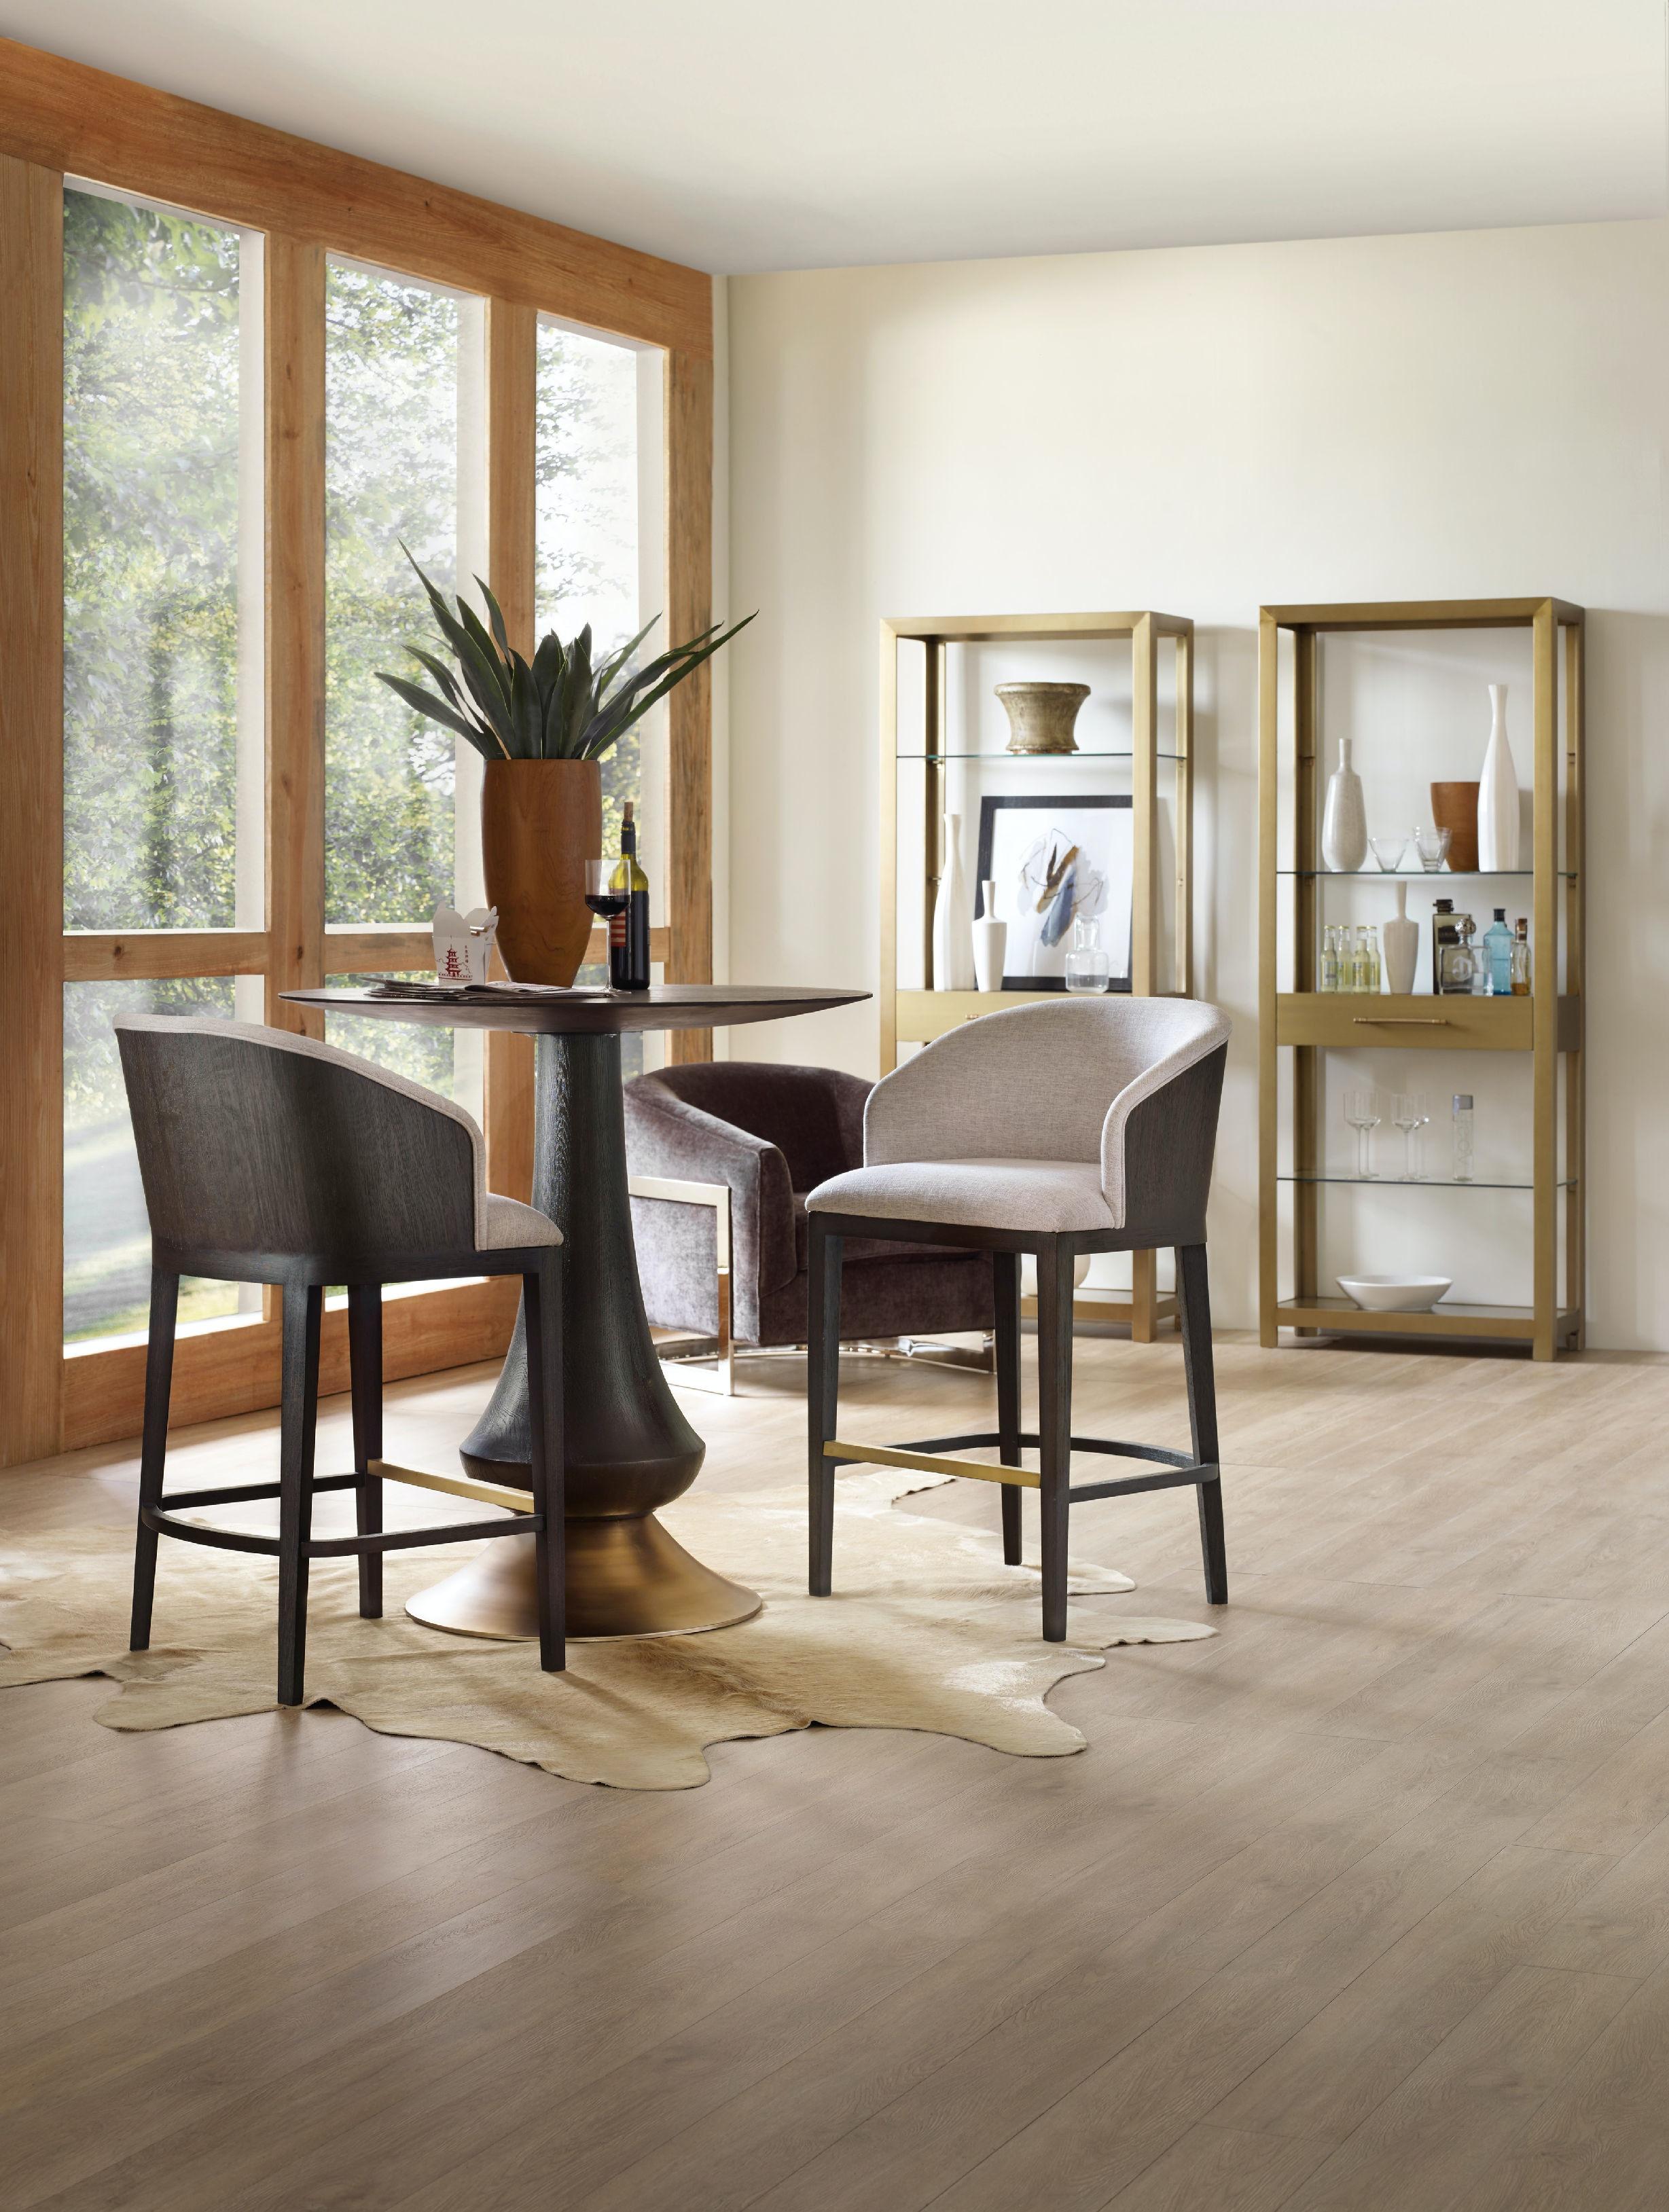 Hooker Furniture Dining Room Curata Pub Table 1600 75202 Dkw Tin Roof Spokane Wa